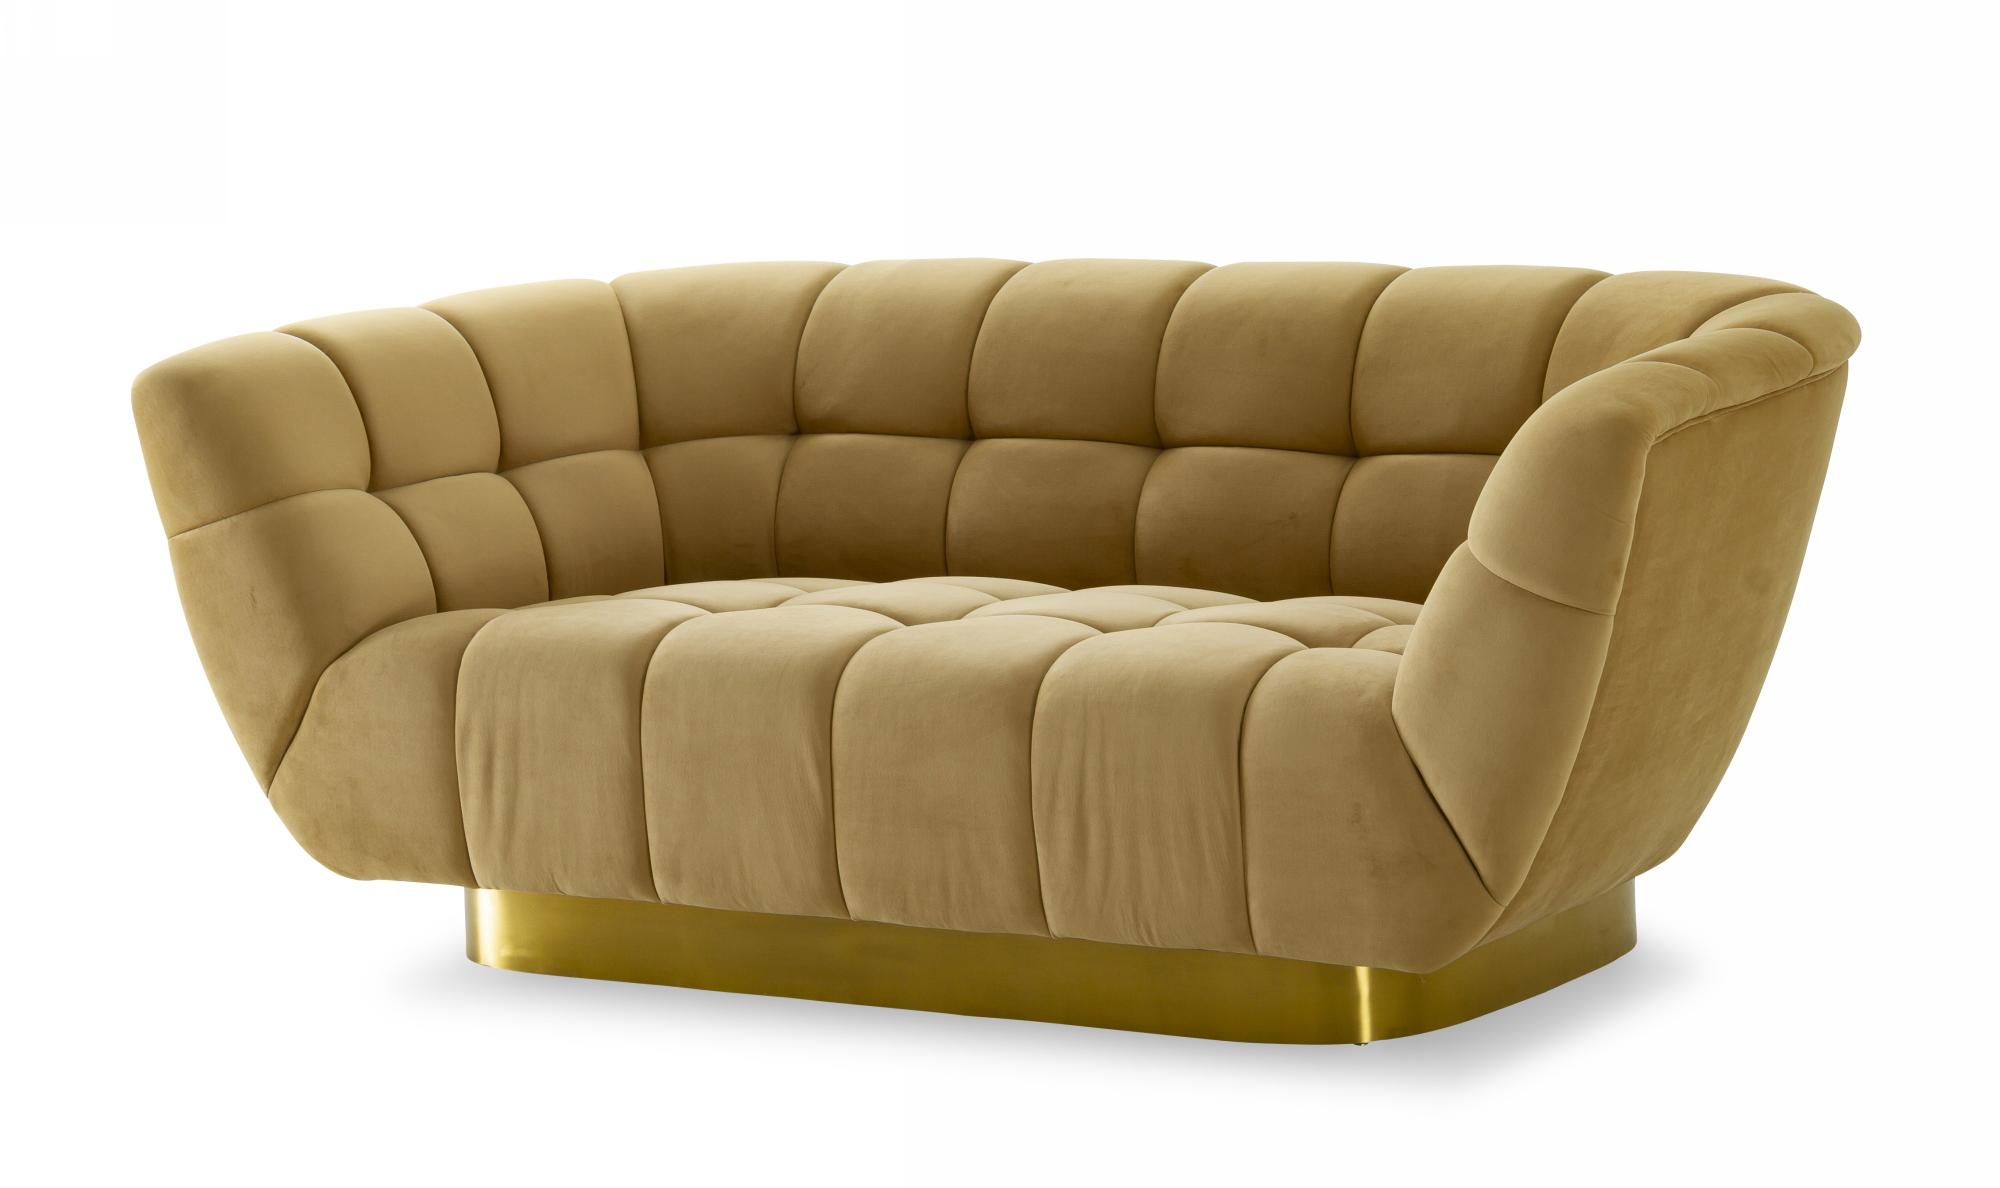 VIG Furniture Divani Casa Granby Glam Mustard and Gold Fabric Loveseat